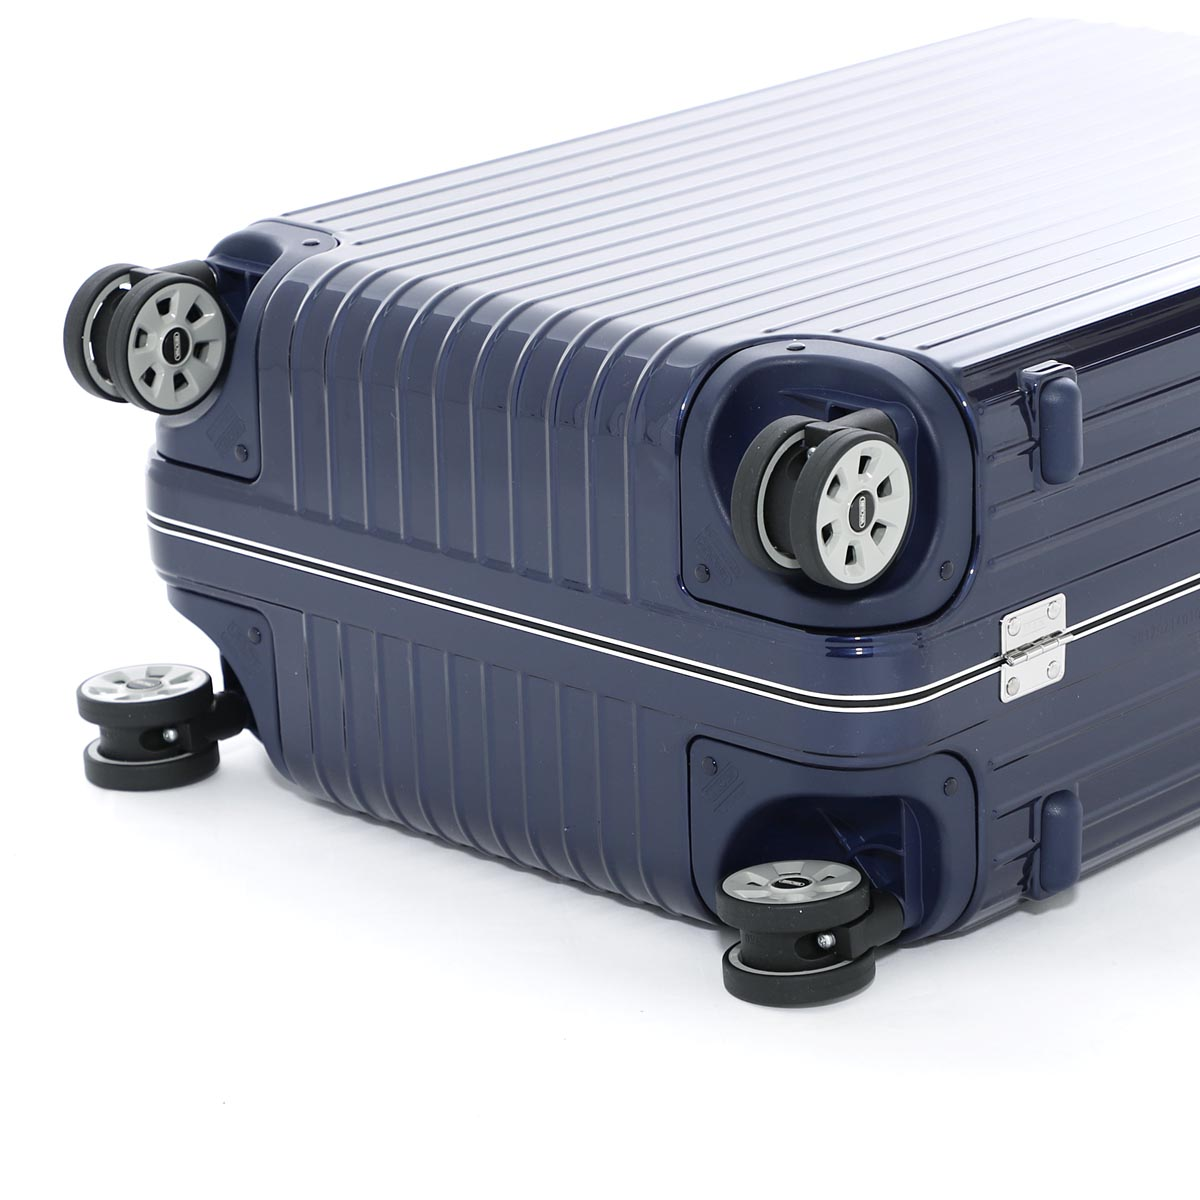 RIMOWA リモワ スーツケース/キャリーケース/LIMBO CABIN 70 MULTIWHEEL 73L リンボ キャビン